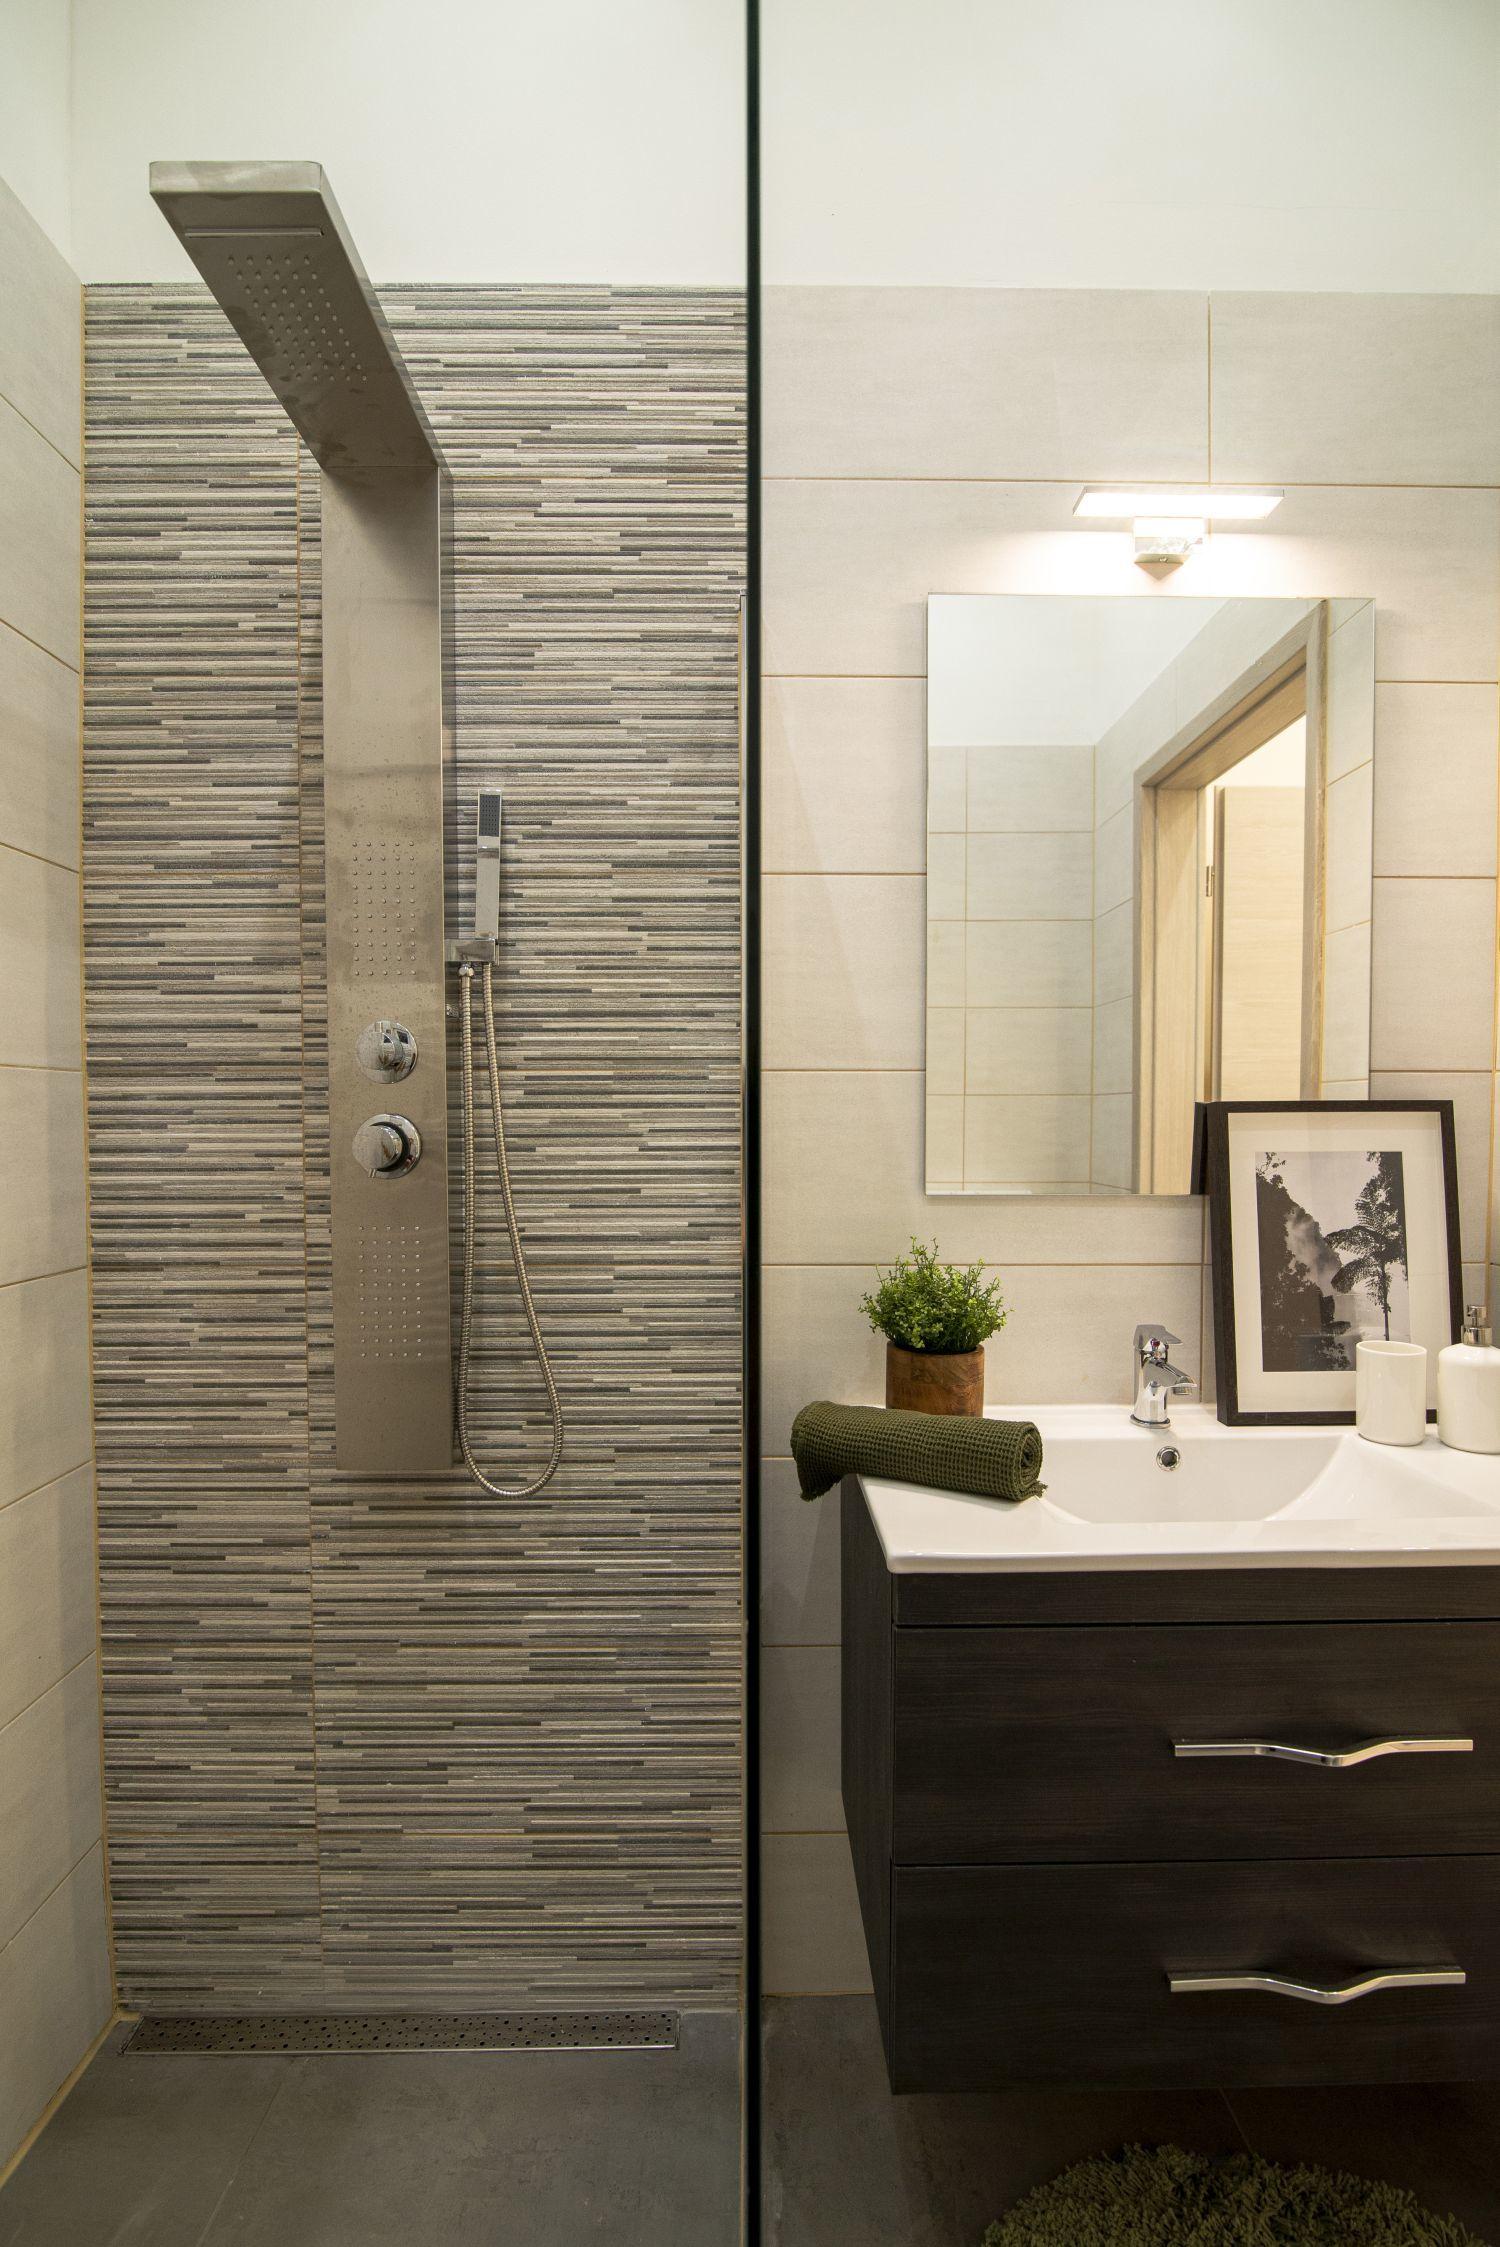 Zuhanypaneles kis fürdőszoba